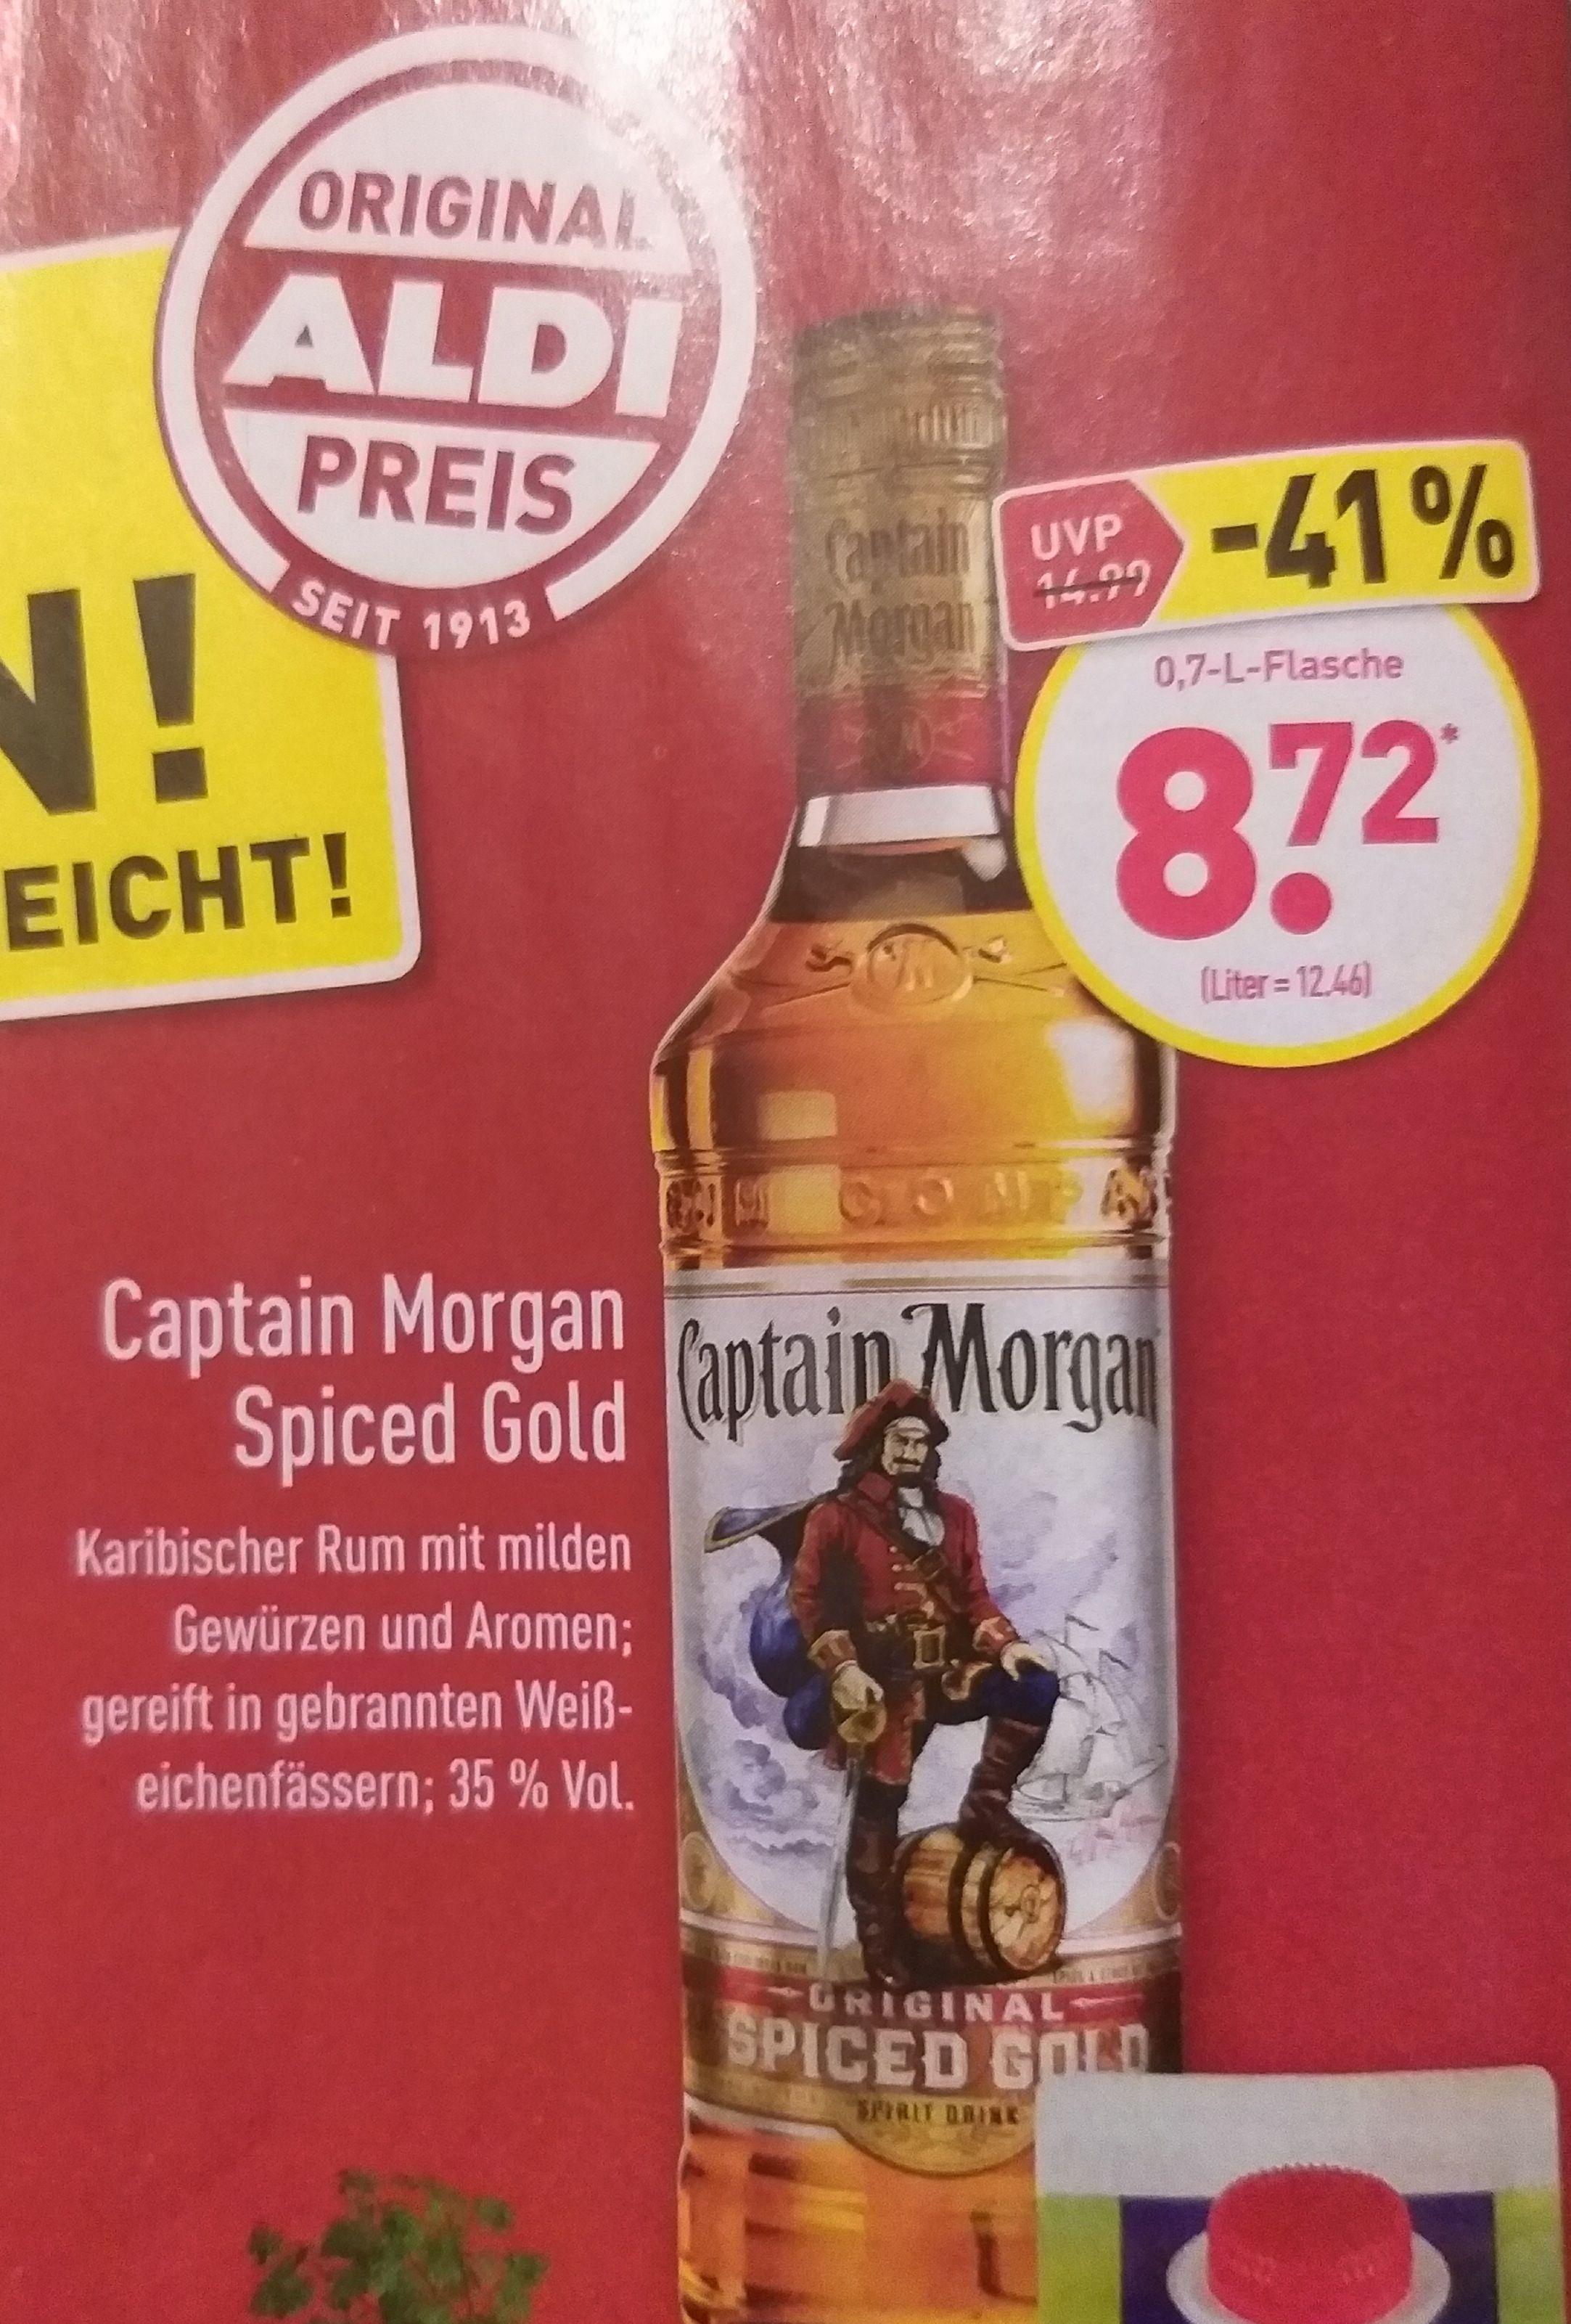 ALDI NORD - Captain Morgan Spiced Gold 0,7 Liter ab 28.12.2020